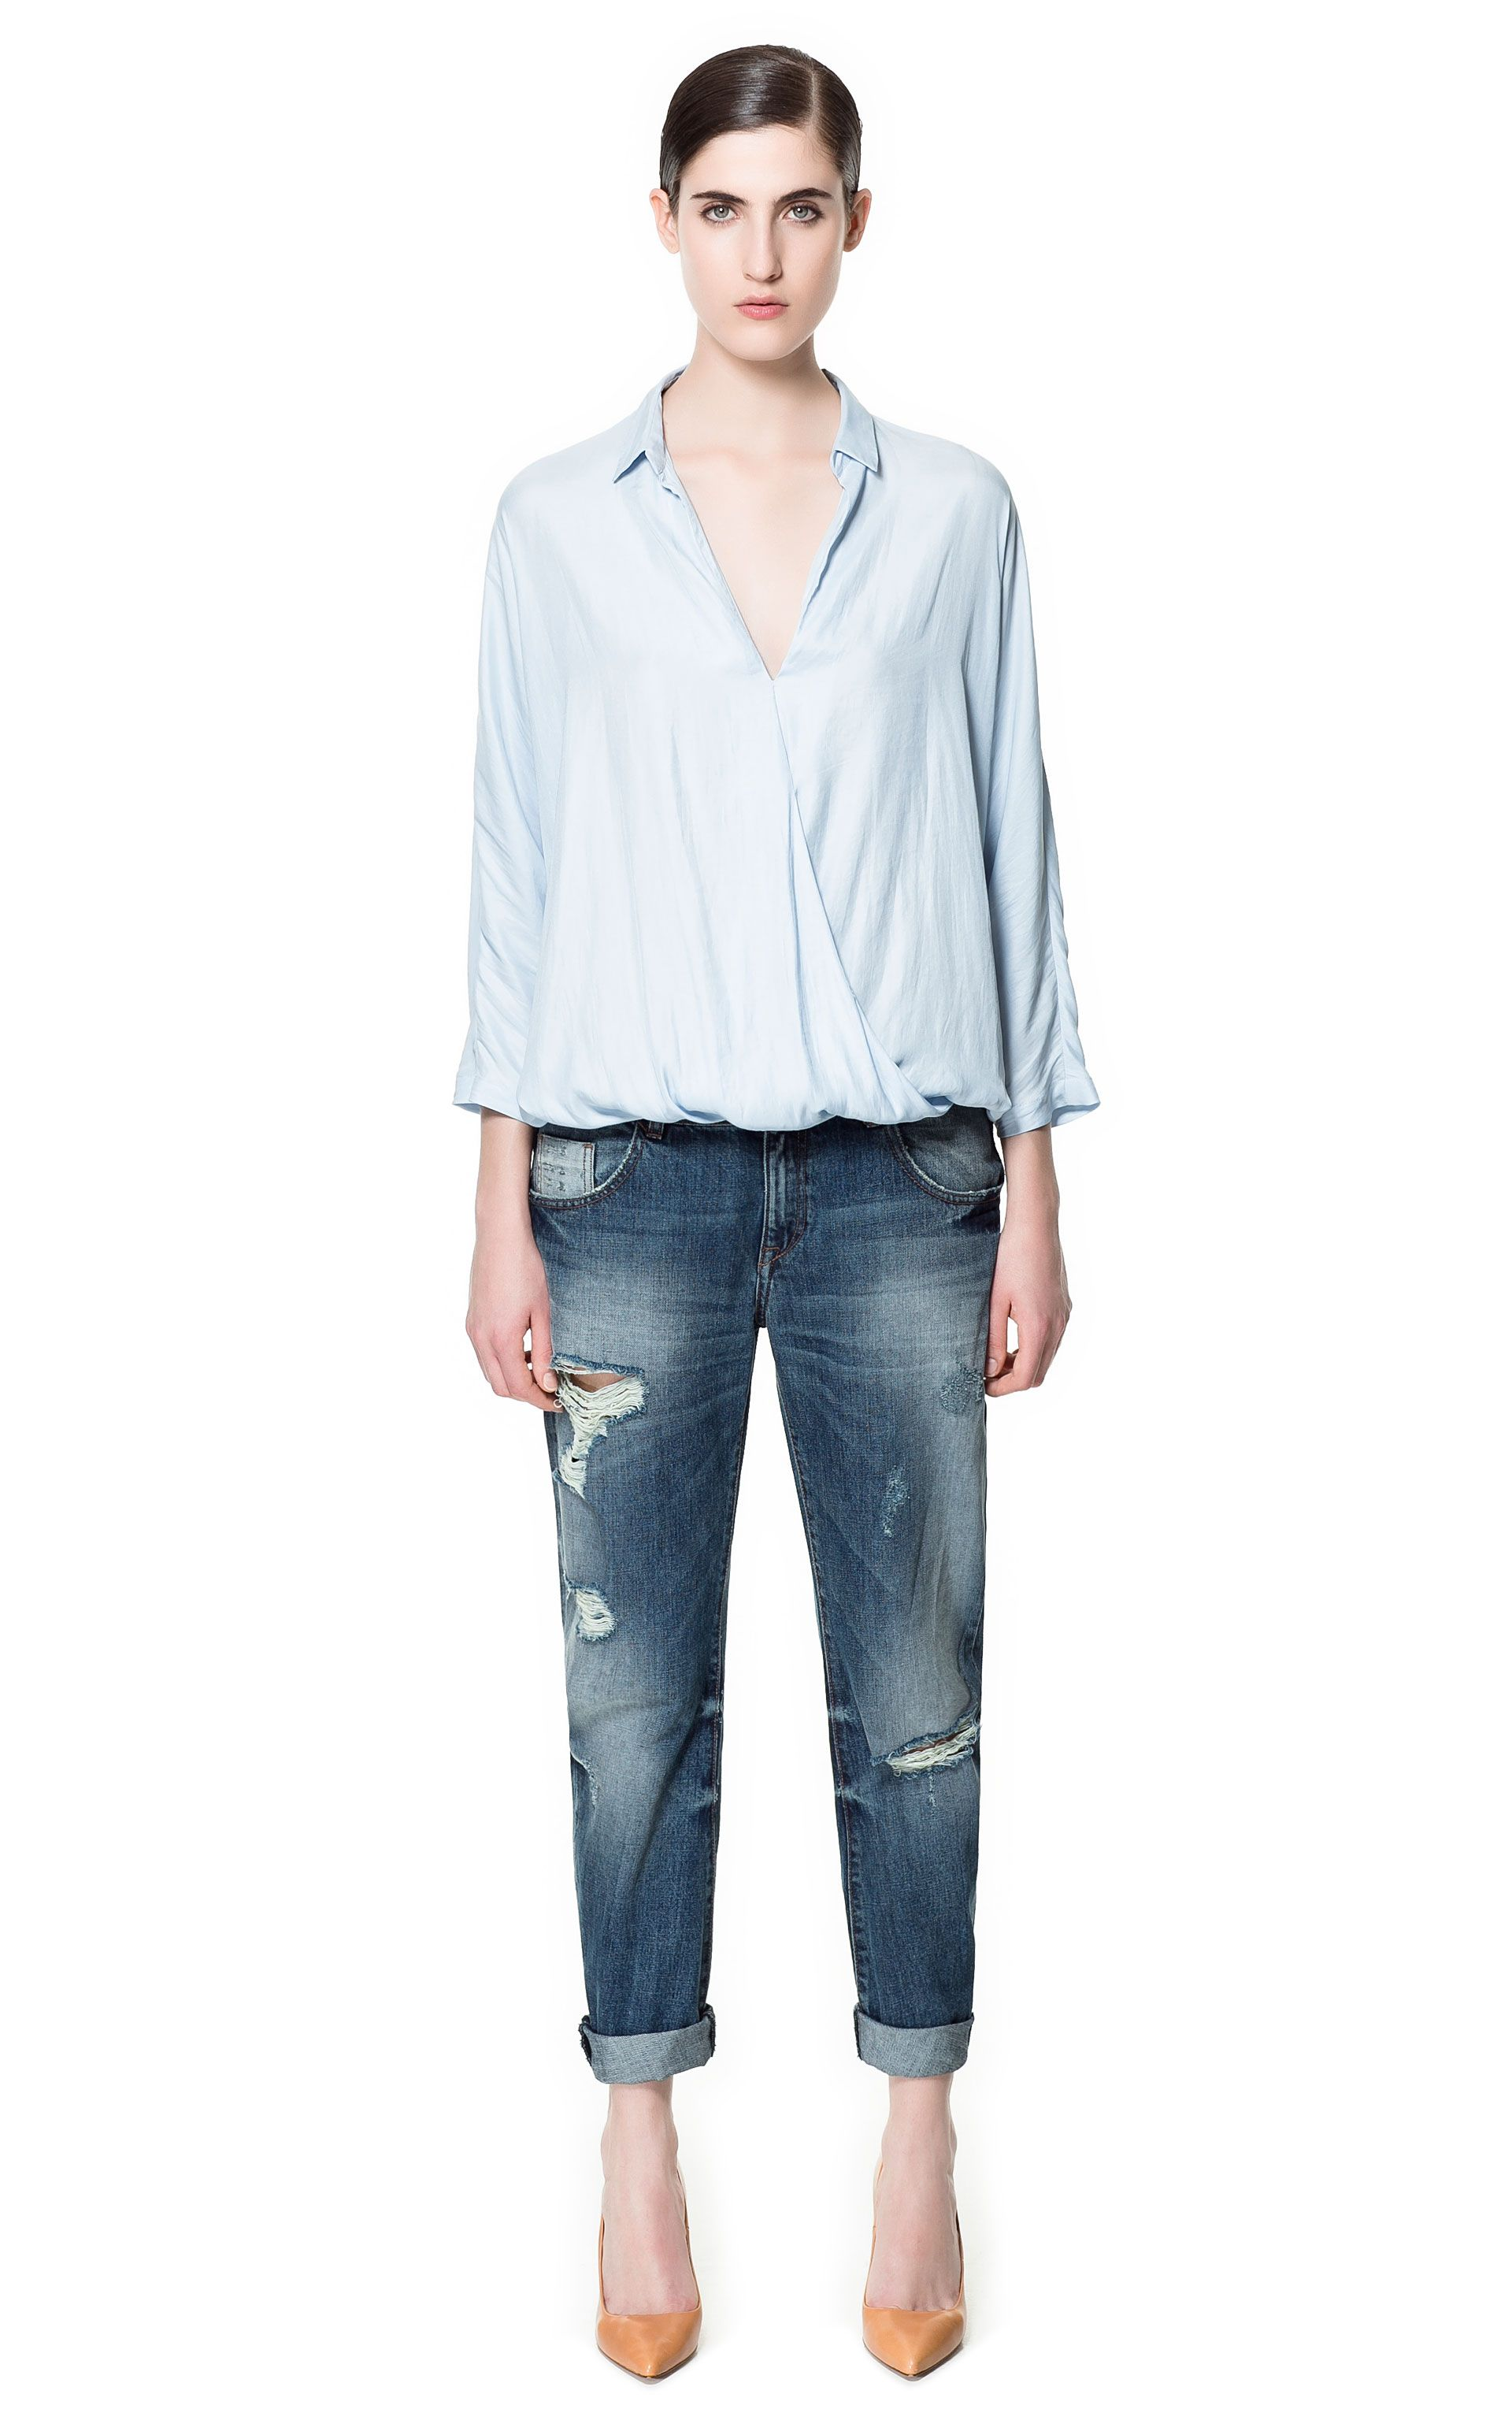 DENIM SLIM BOYFRIEND - Jeans - Femme - ZARA France    0213   Women s ... b07cc9645acf